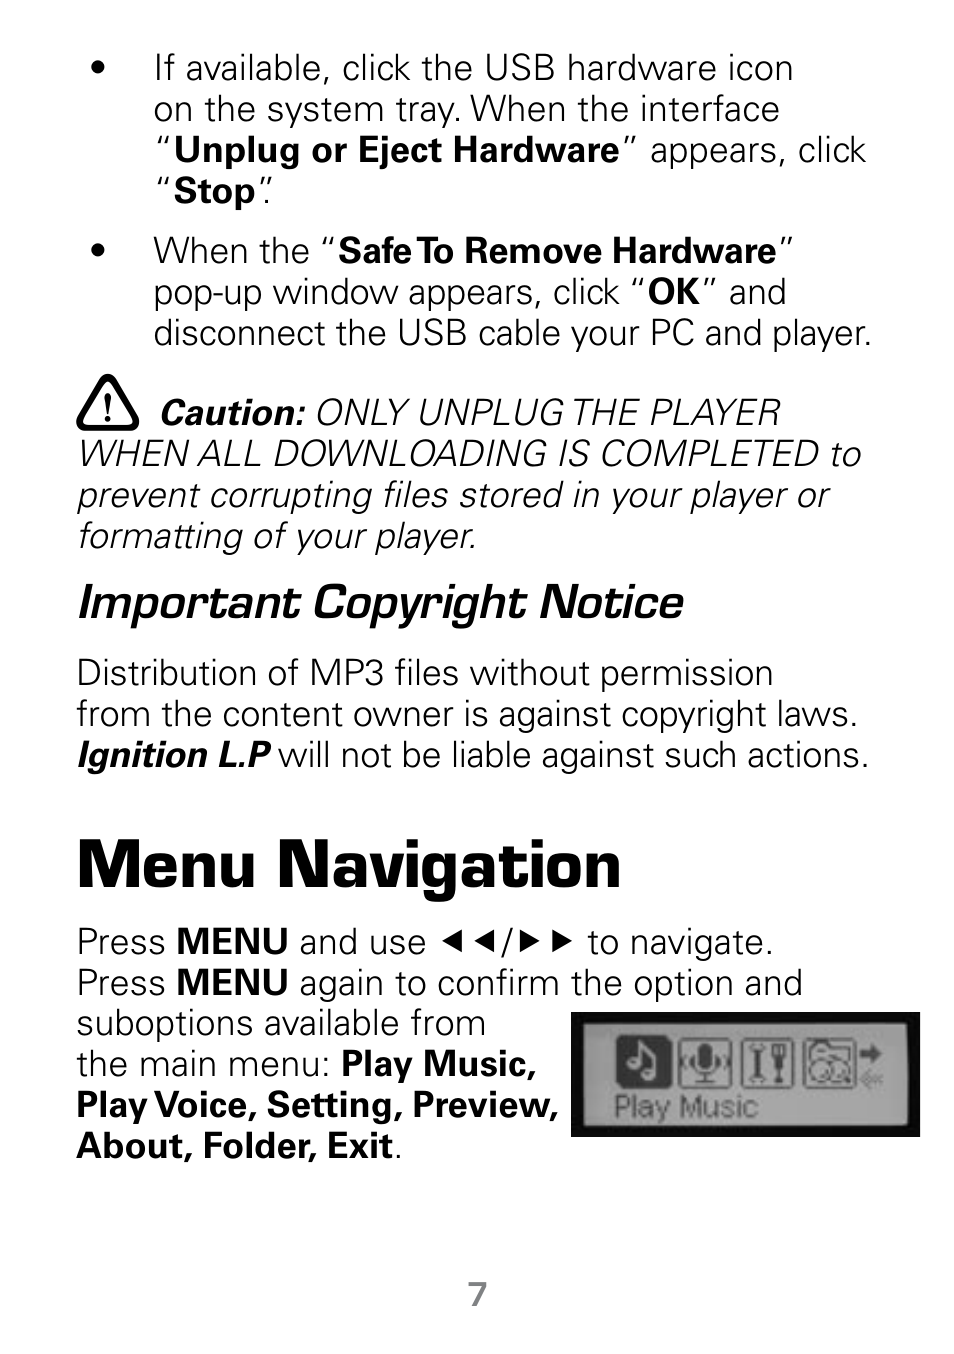 Notice Of Copyright Importance | Menu Navigation Important Copyright Notice Radio Shack Gigaware